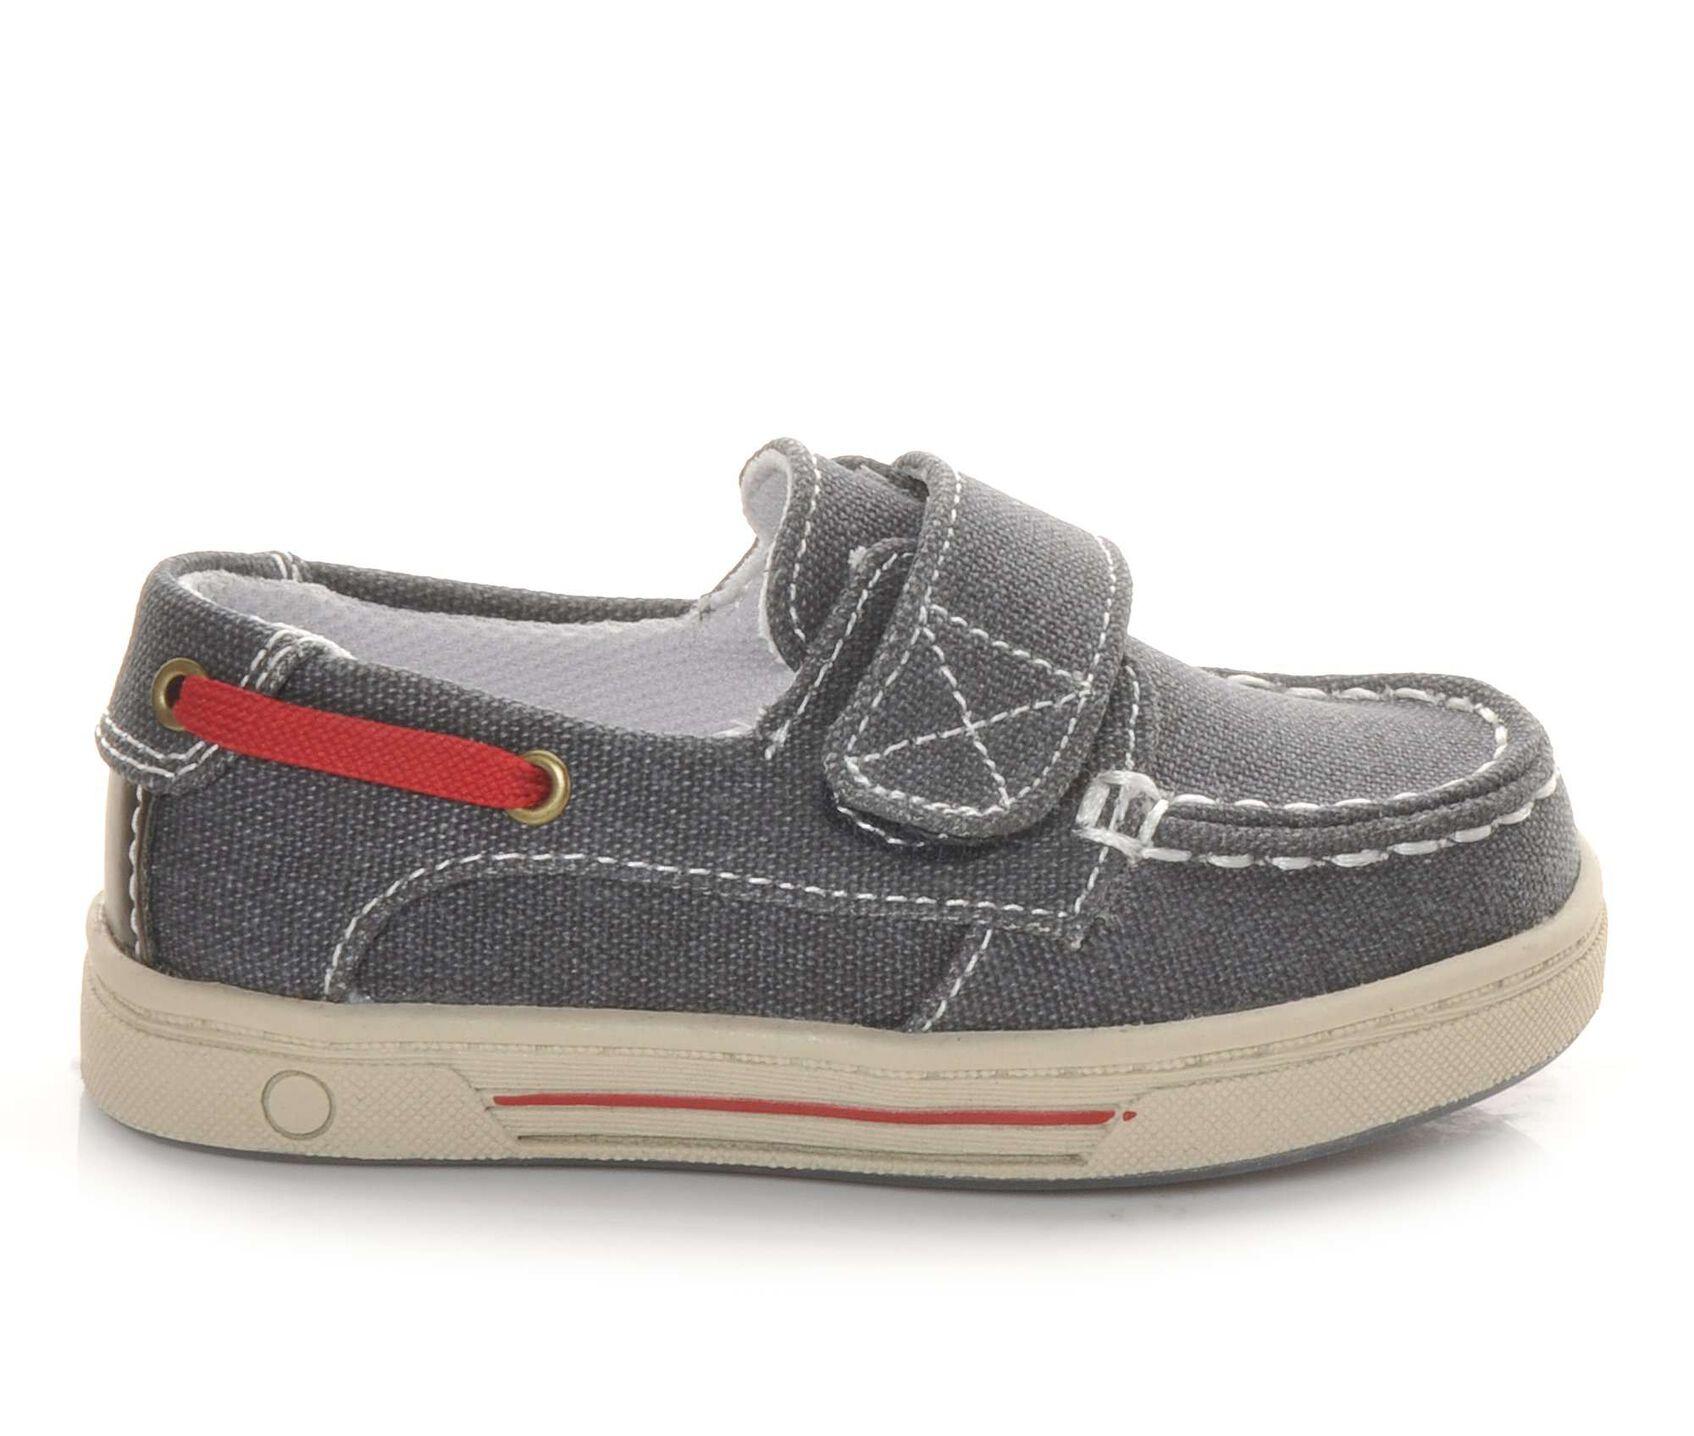 Boys Anchors Edge Bay Infant Boys Spencer 5 10 Boat Shoes